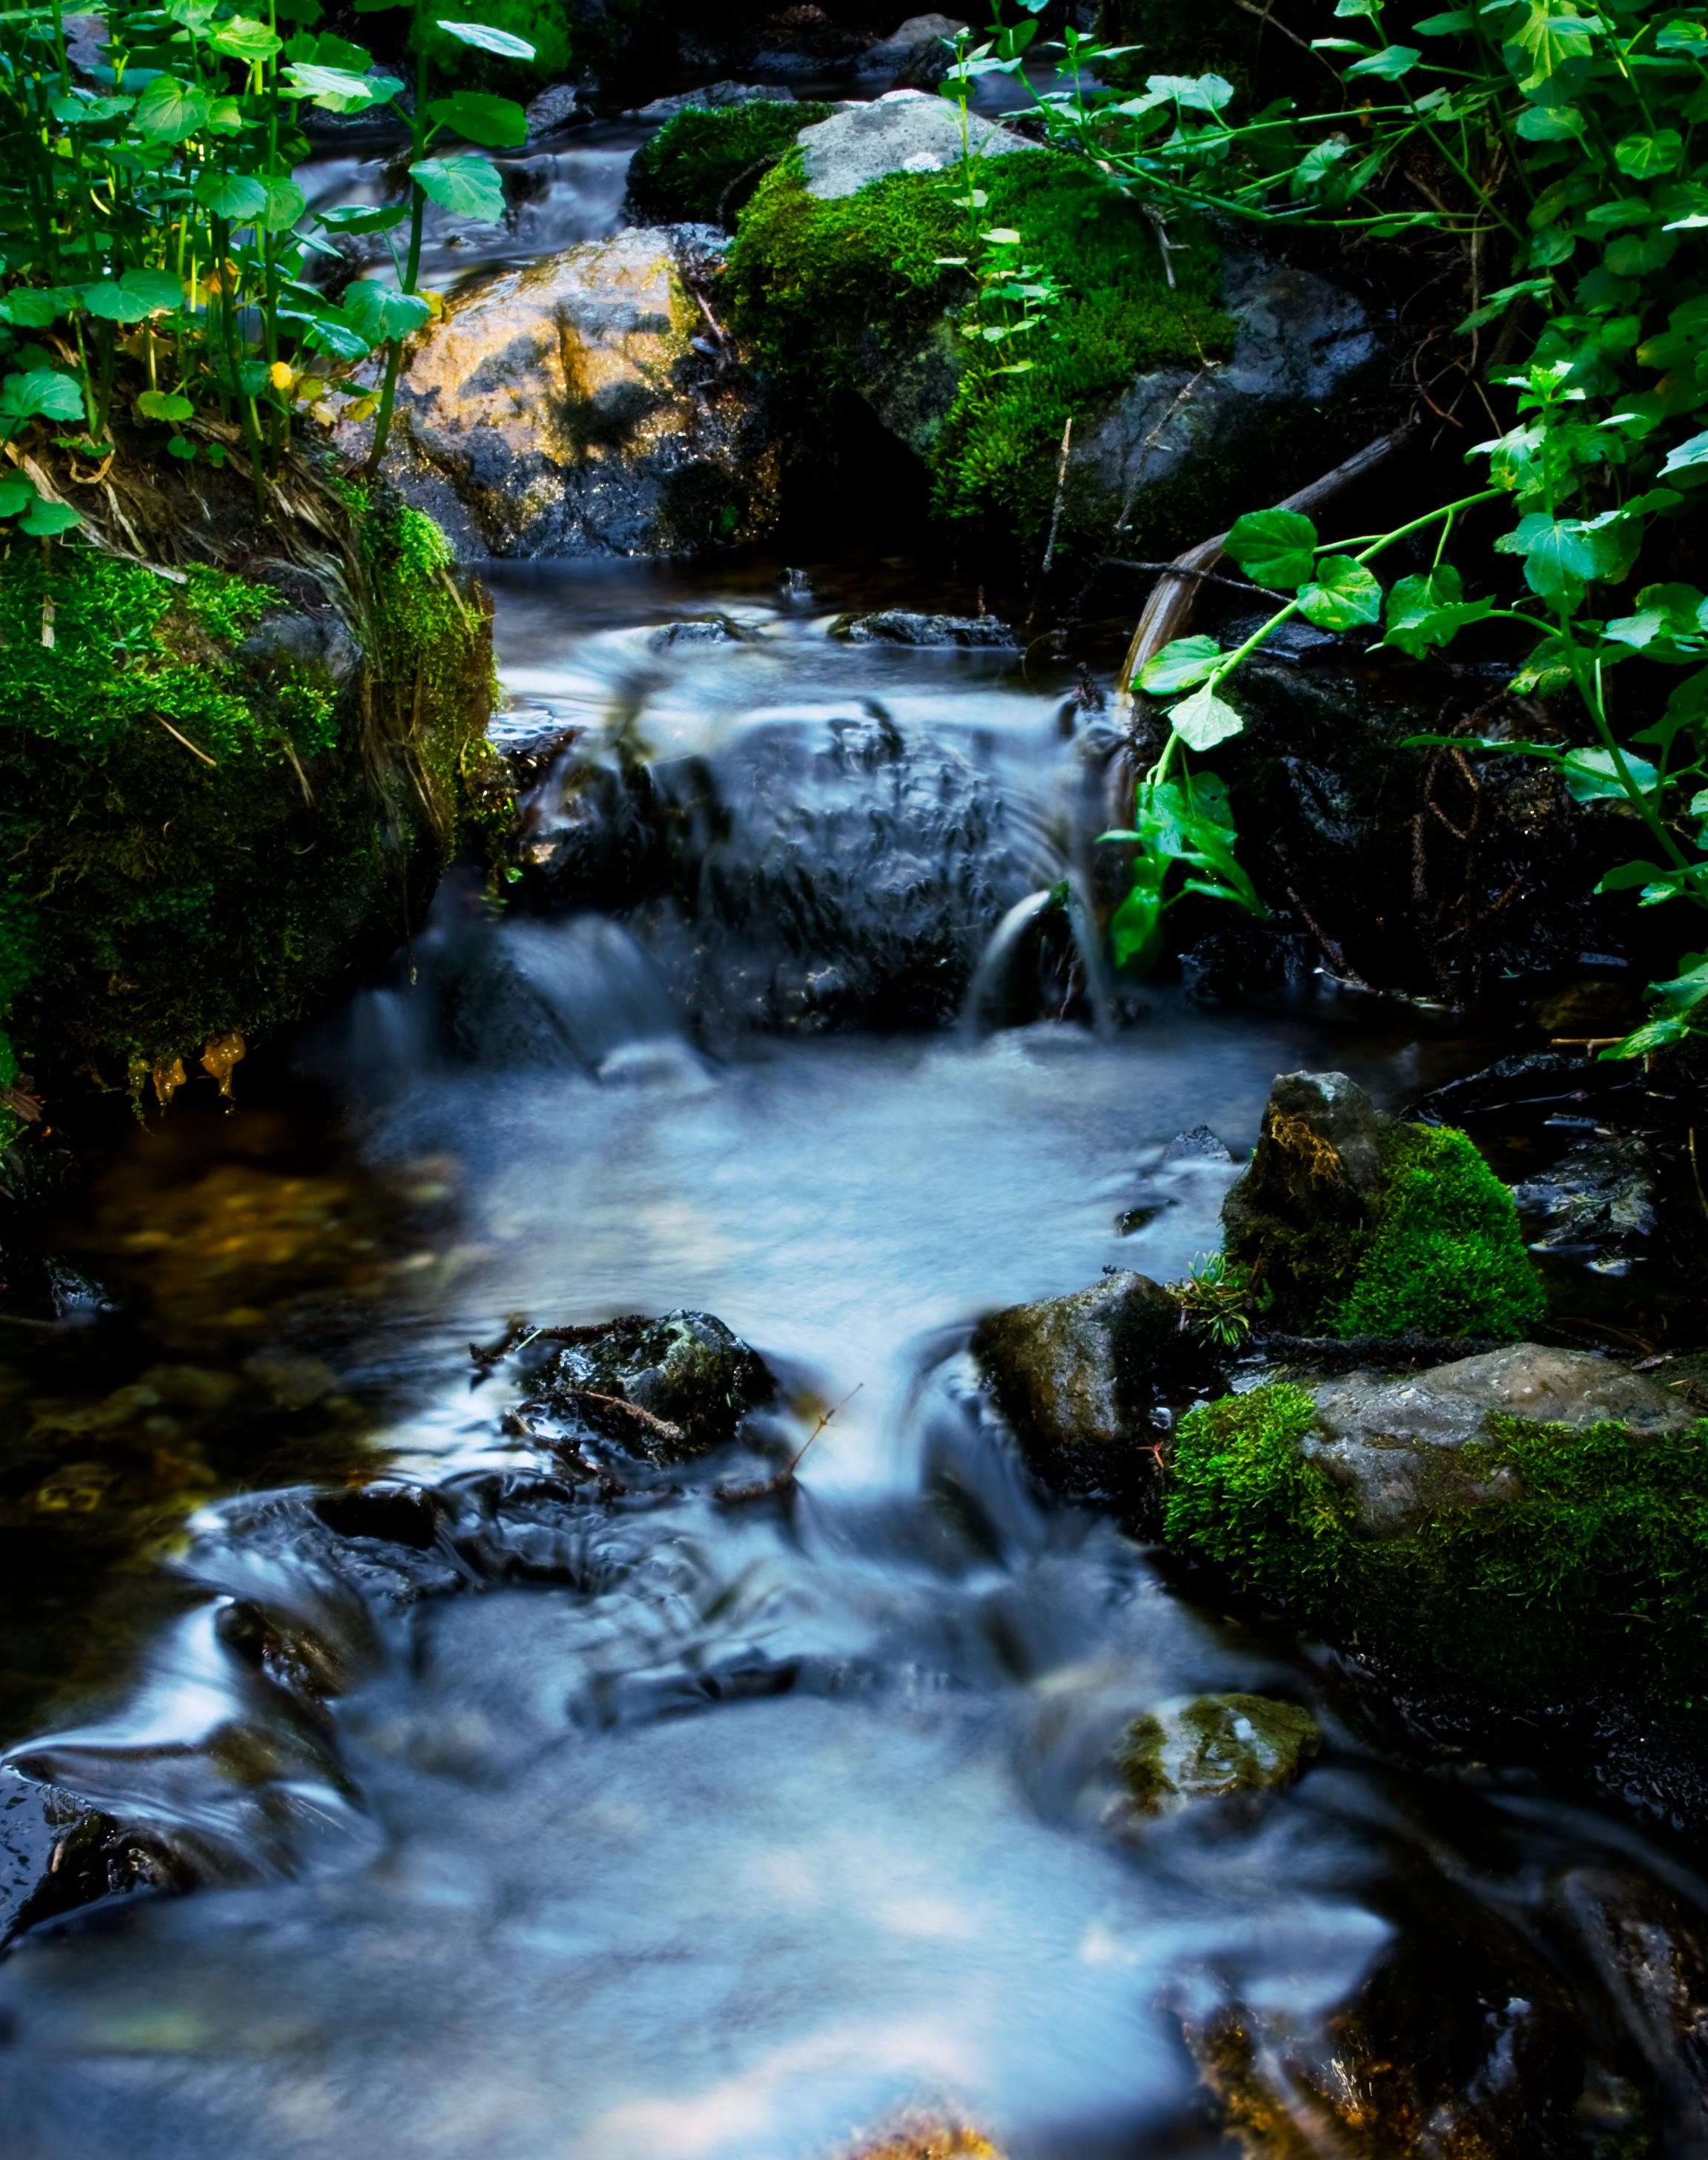 Mountain Stream, Algae, Exposure, Flowing, Fresh, HQ Photo